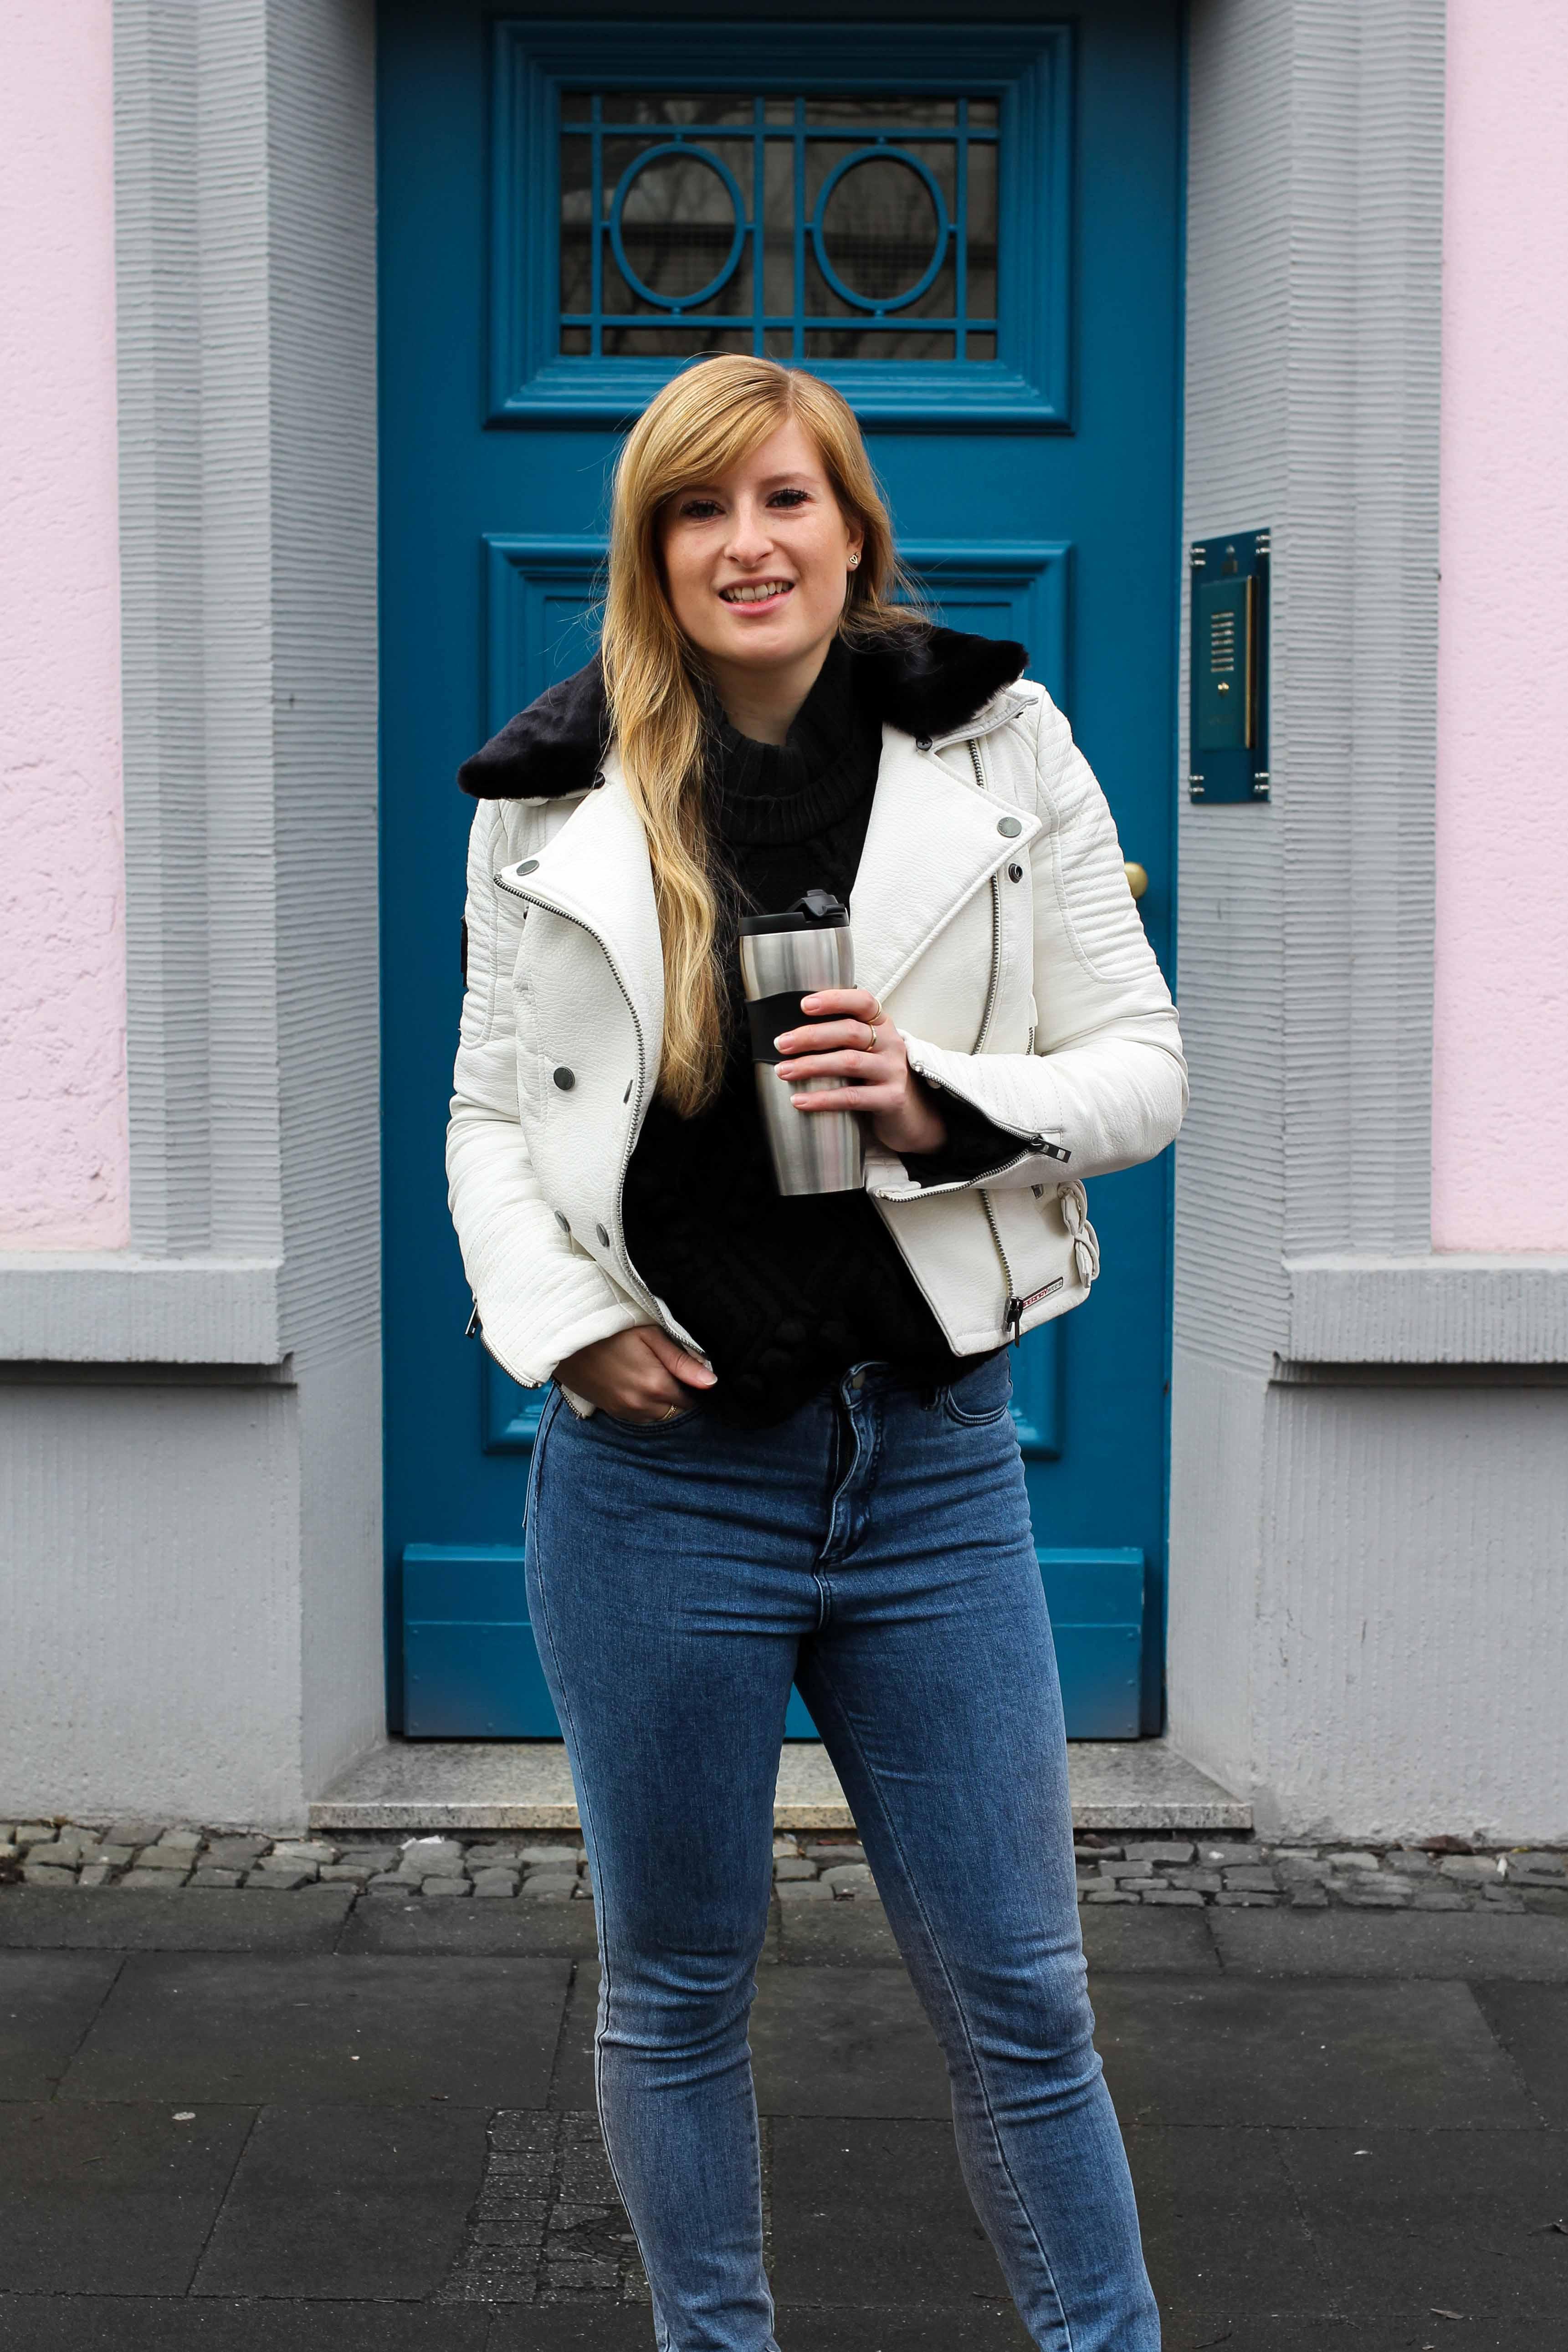 Weiße Lederjacke kombinieren Blaue Highwaist Jeans blaue Tür Casual Streetstyle Modeblog Bonn 3